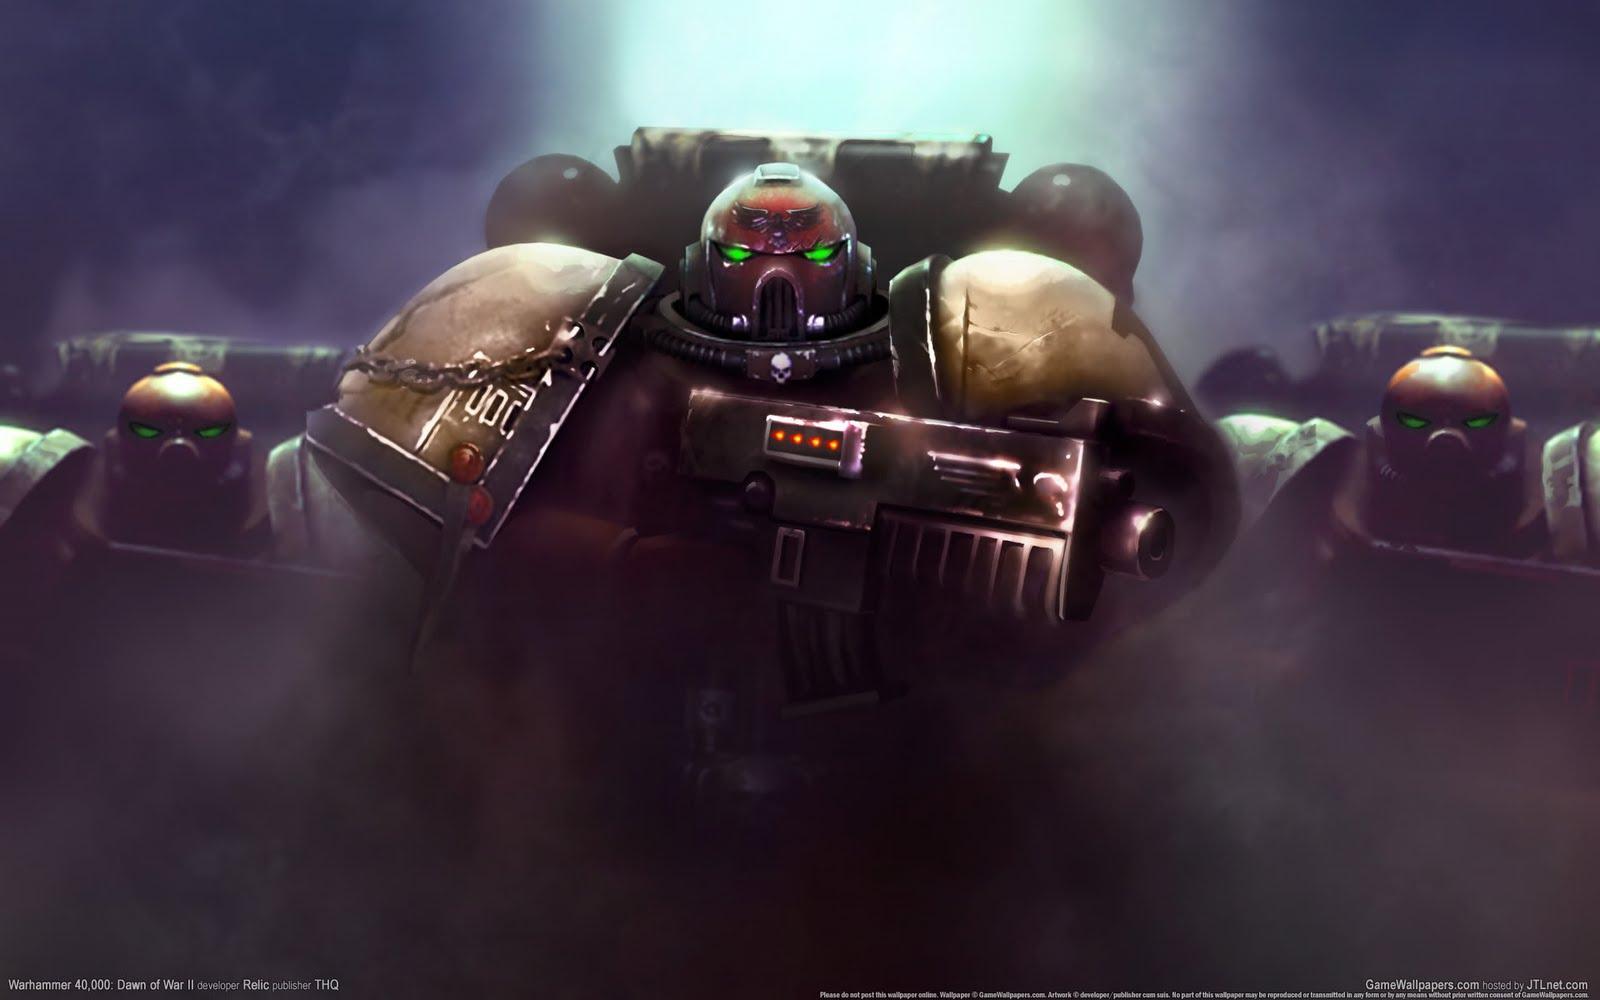 Warhammer clipart 1080p 1kaasuY/ http://4 40k com/_md7 blogspot